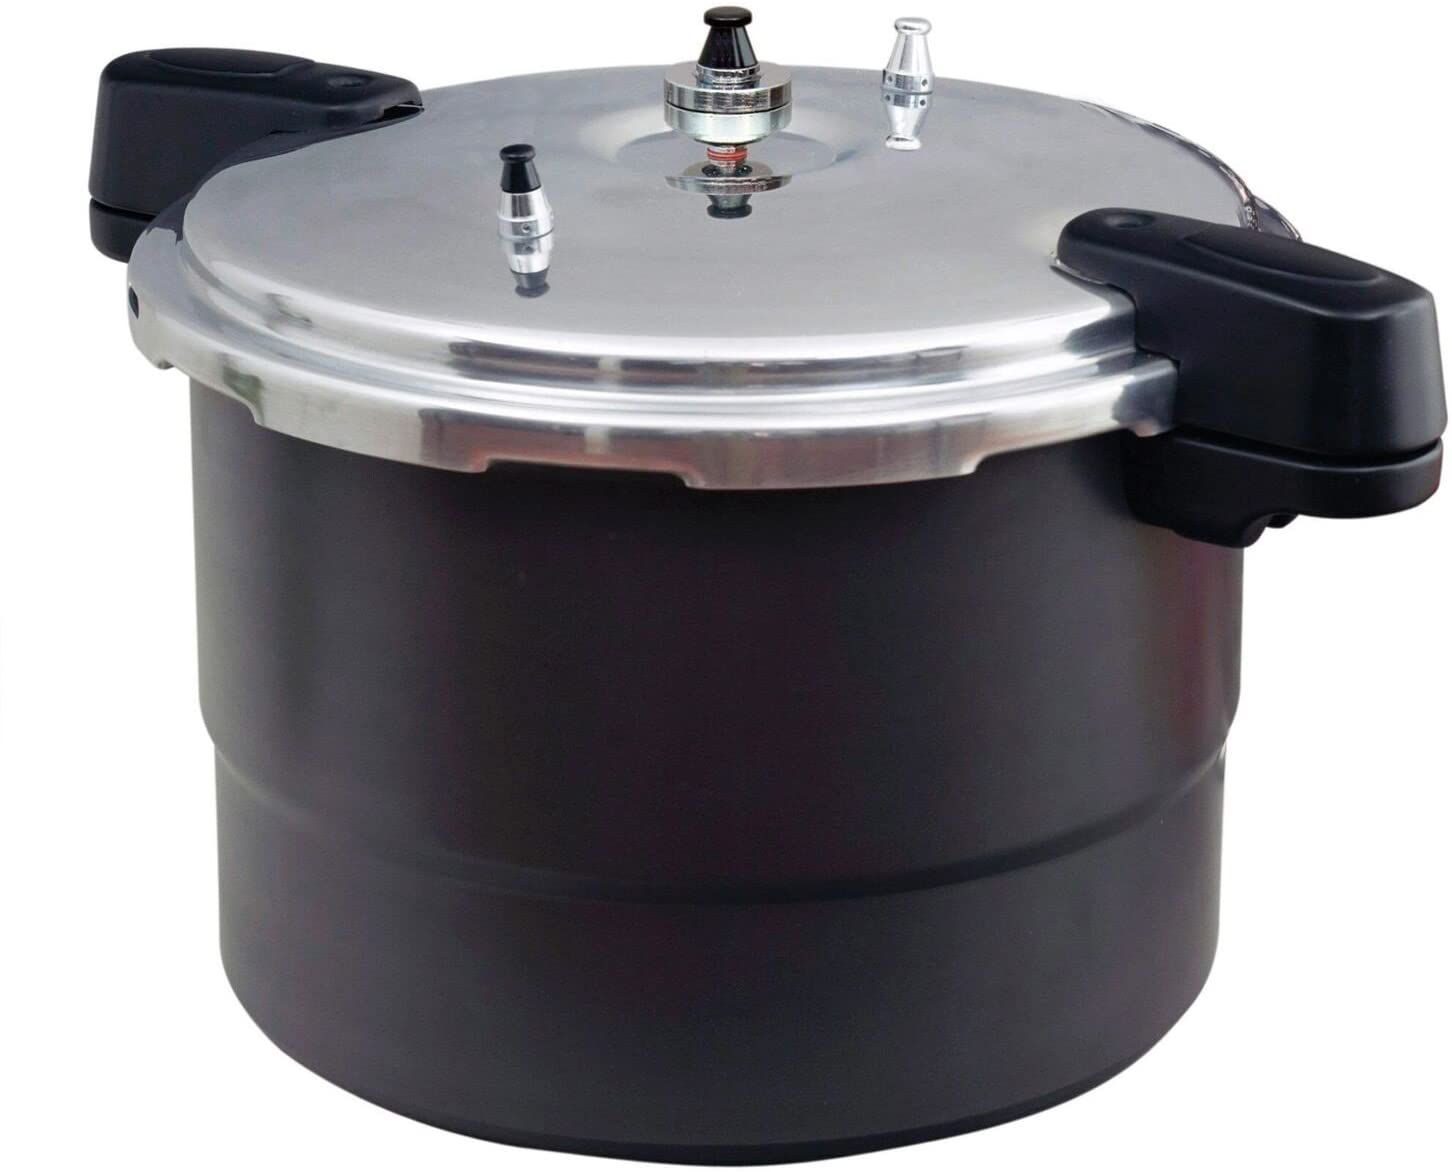 Granite Ware 20-Quart Pressure Canner Cooker Steamer